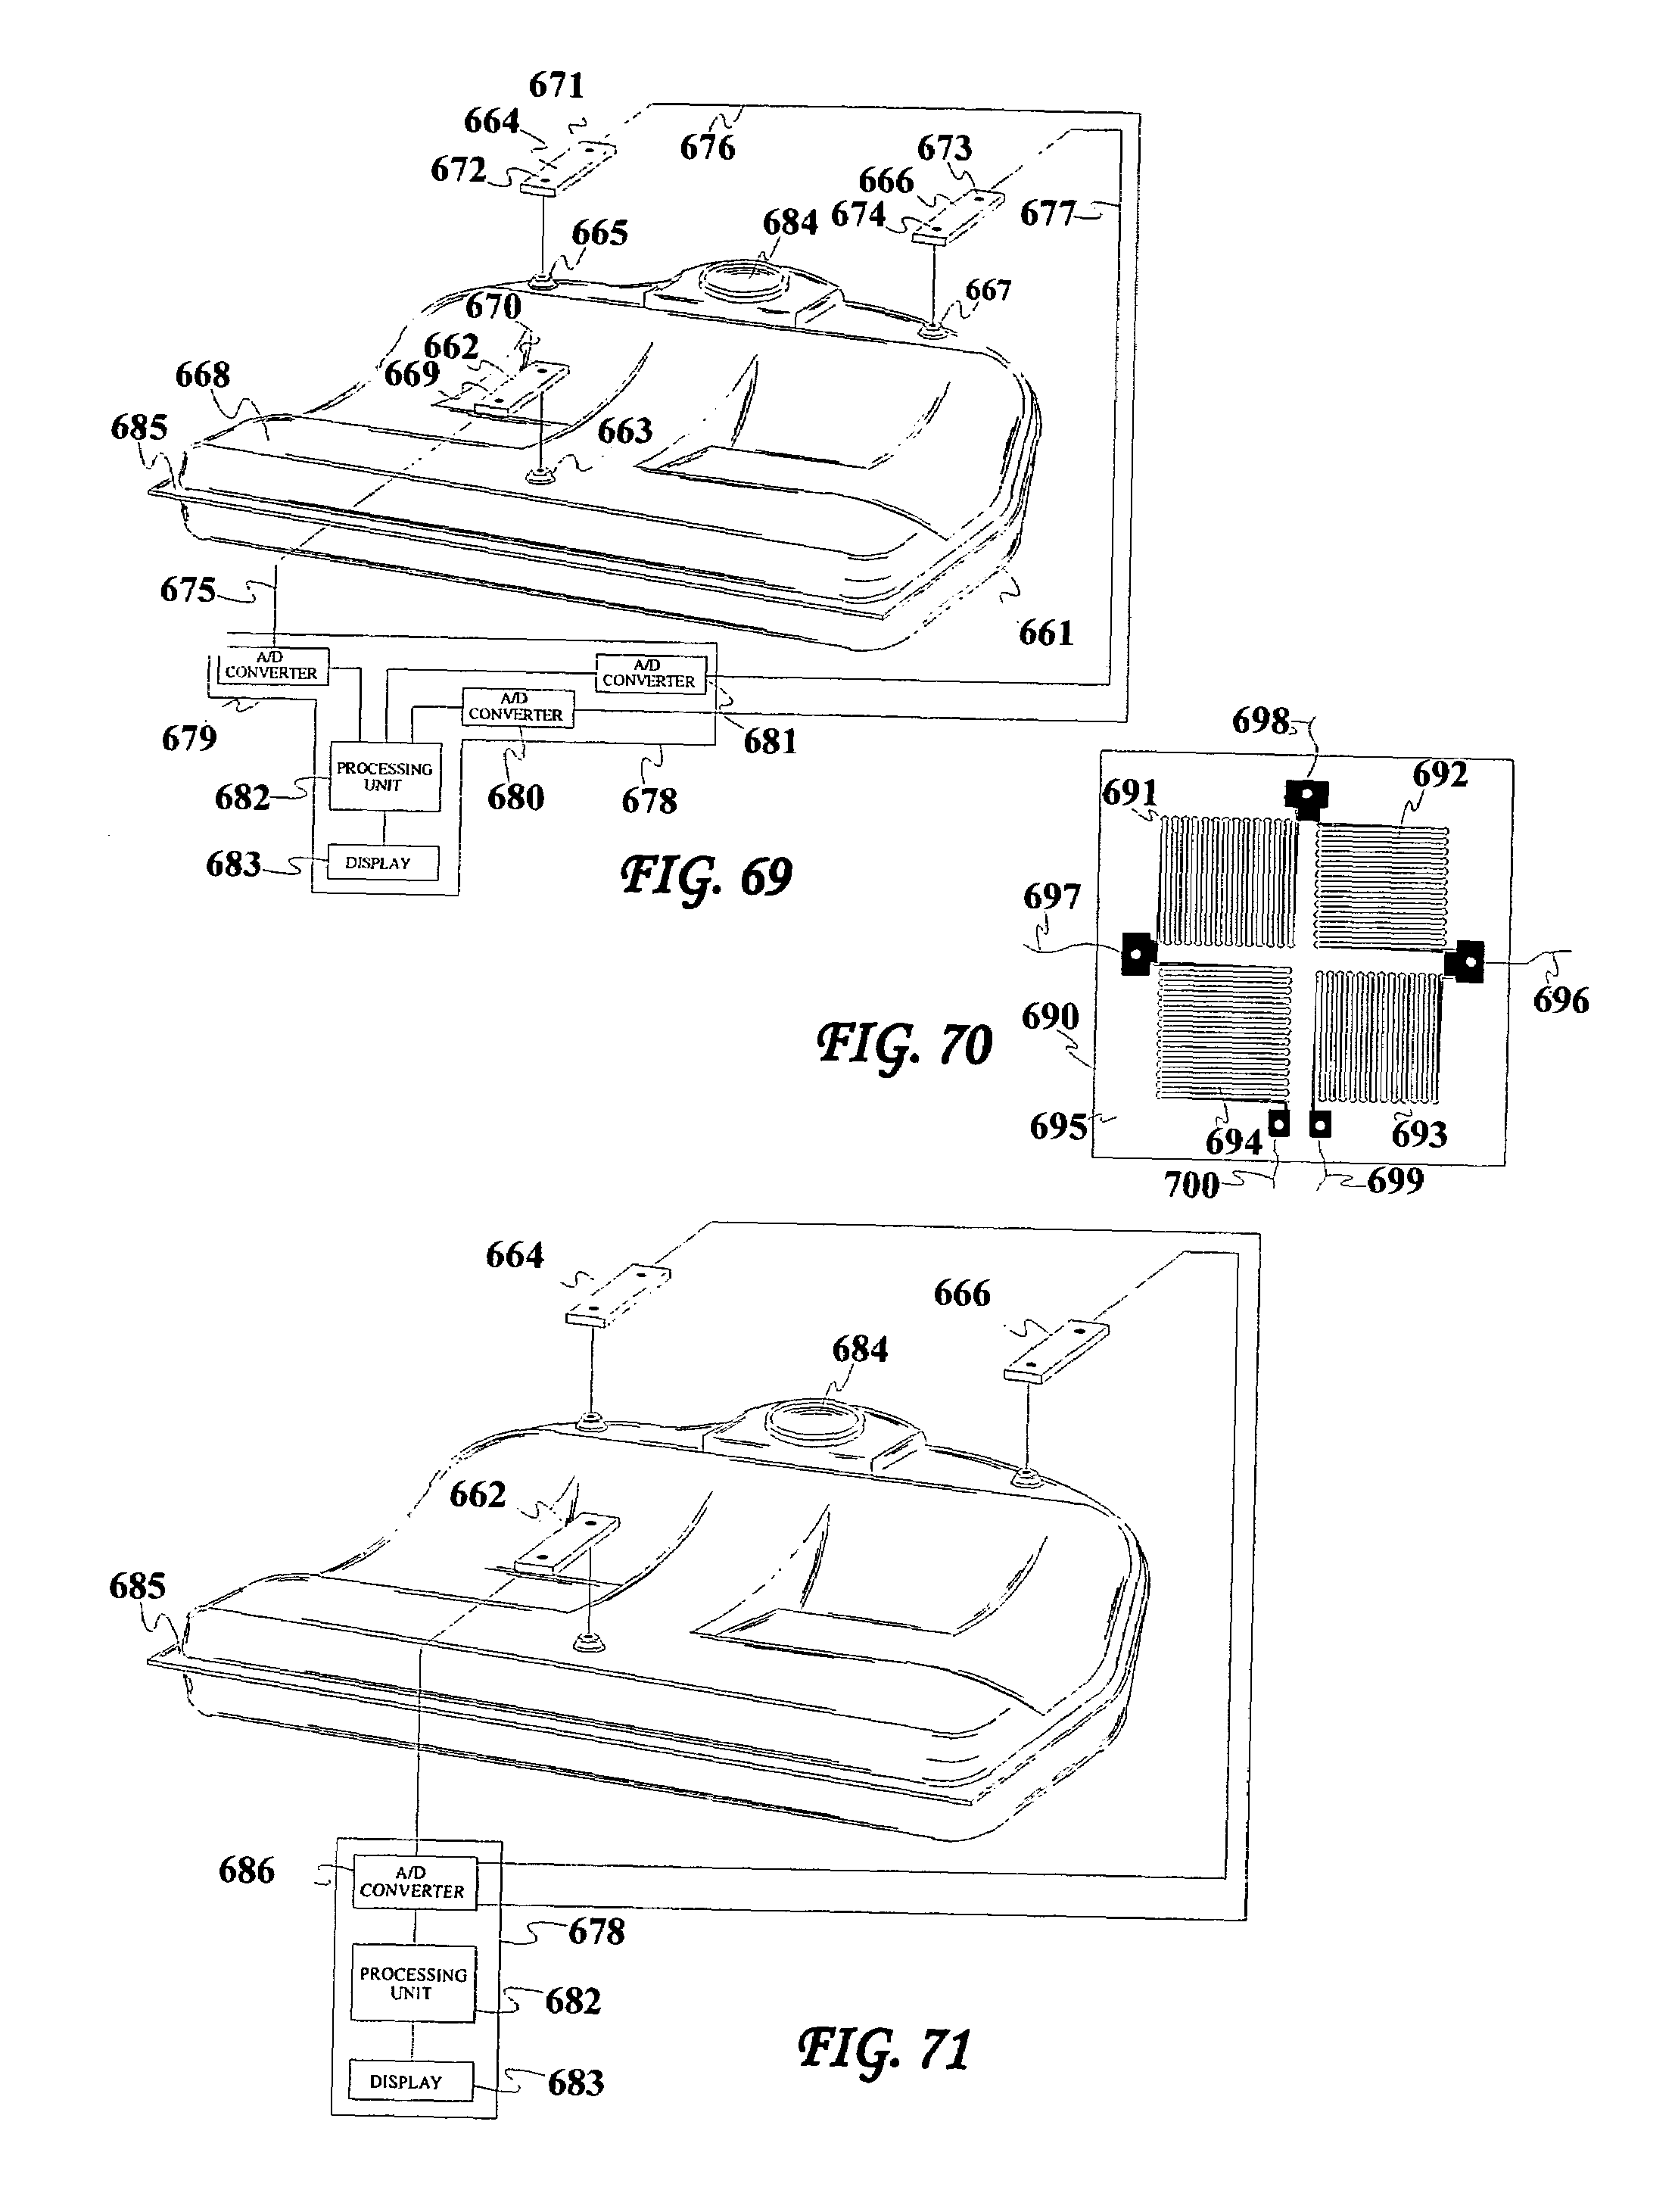 patent us 7 103 460 b1 Legacy Wiring Diagram patent images